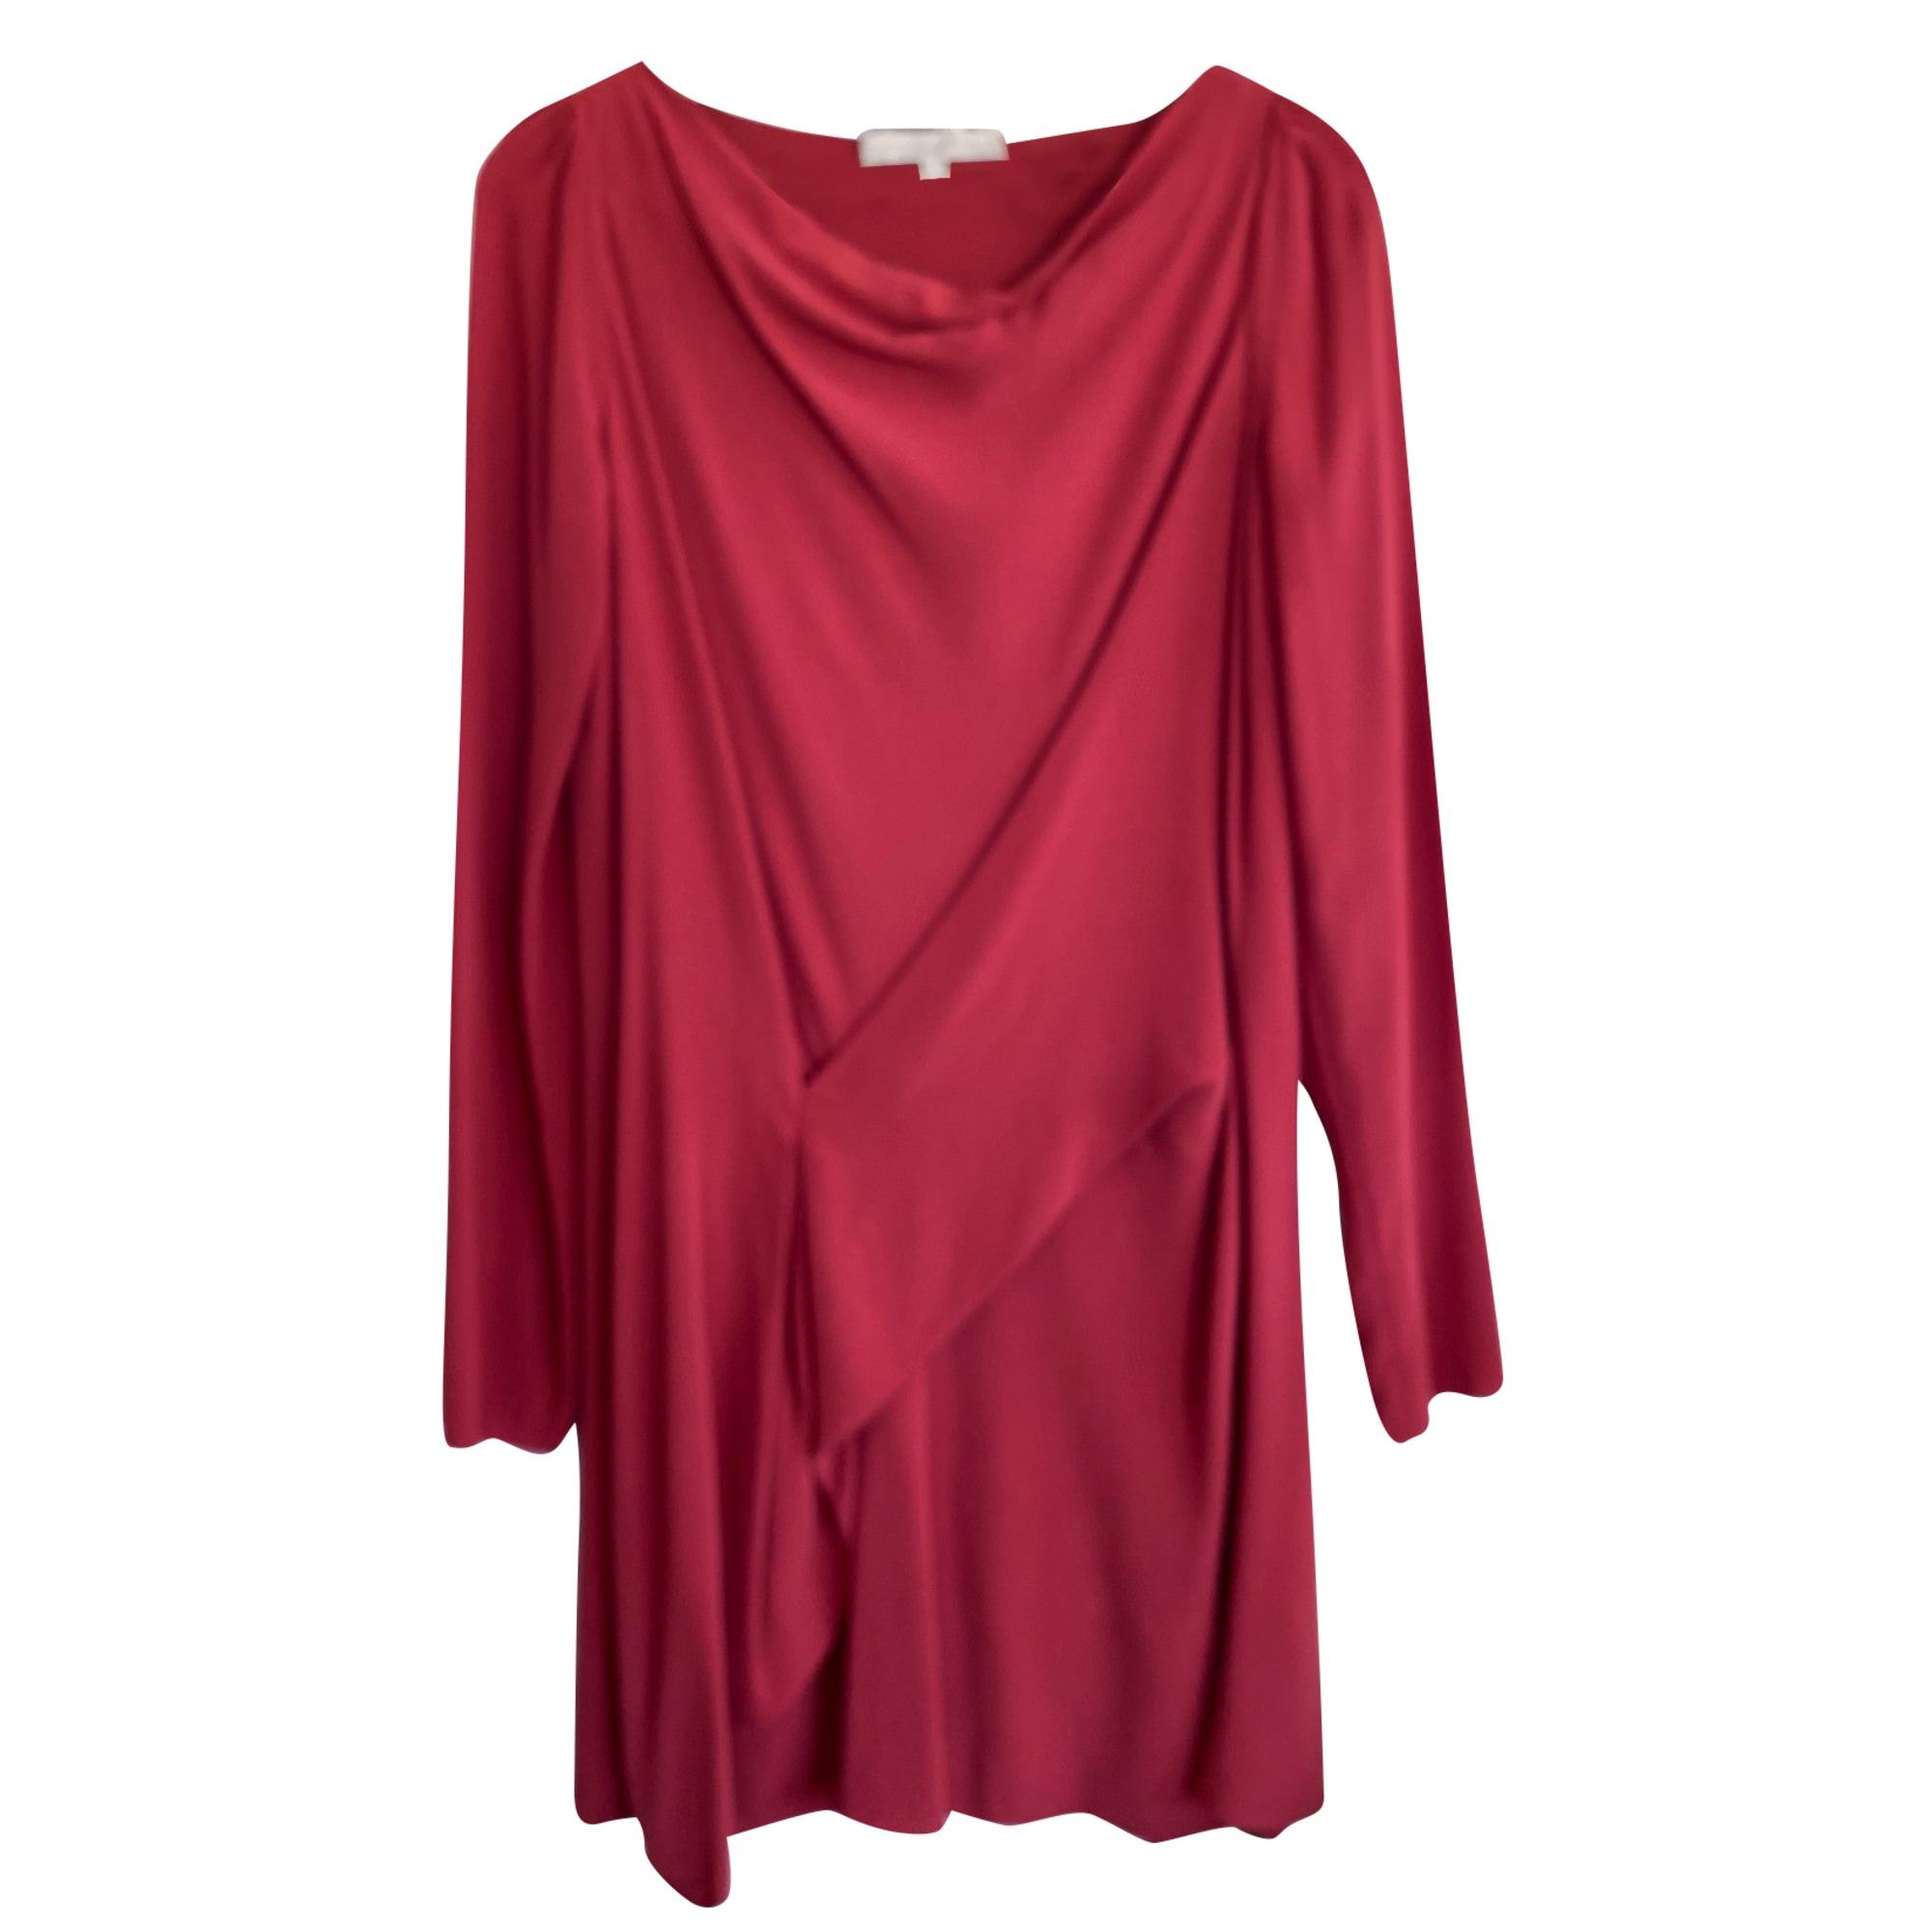 Robe courte VANESSA BRUNO Rouge, bordeaux